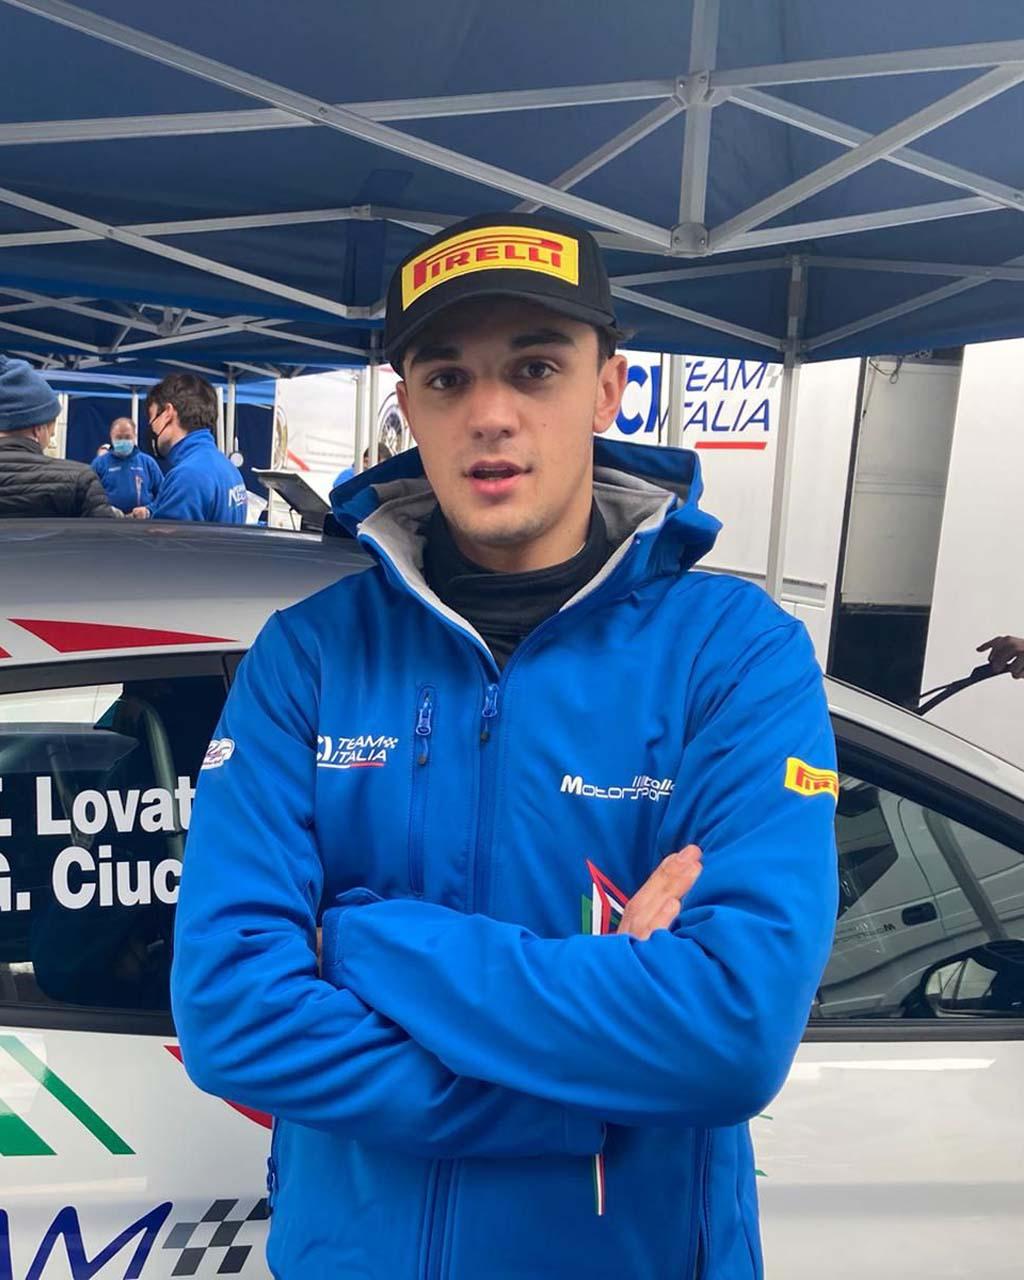 Francesco Lovati ()